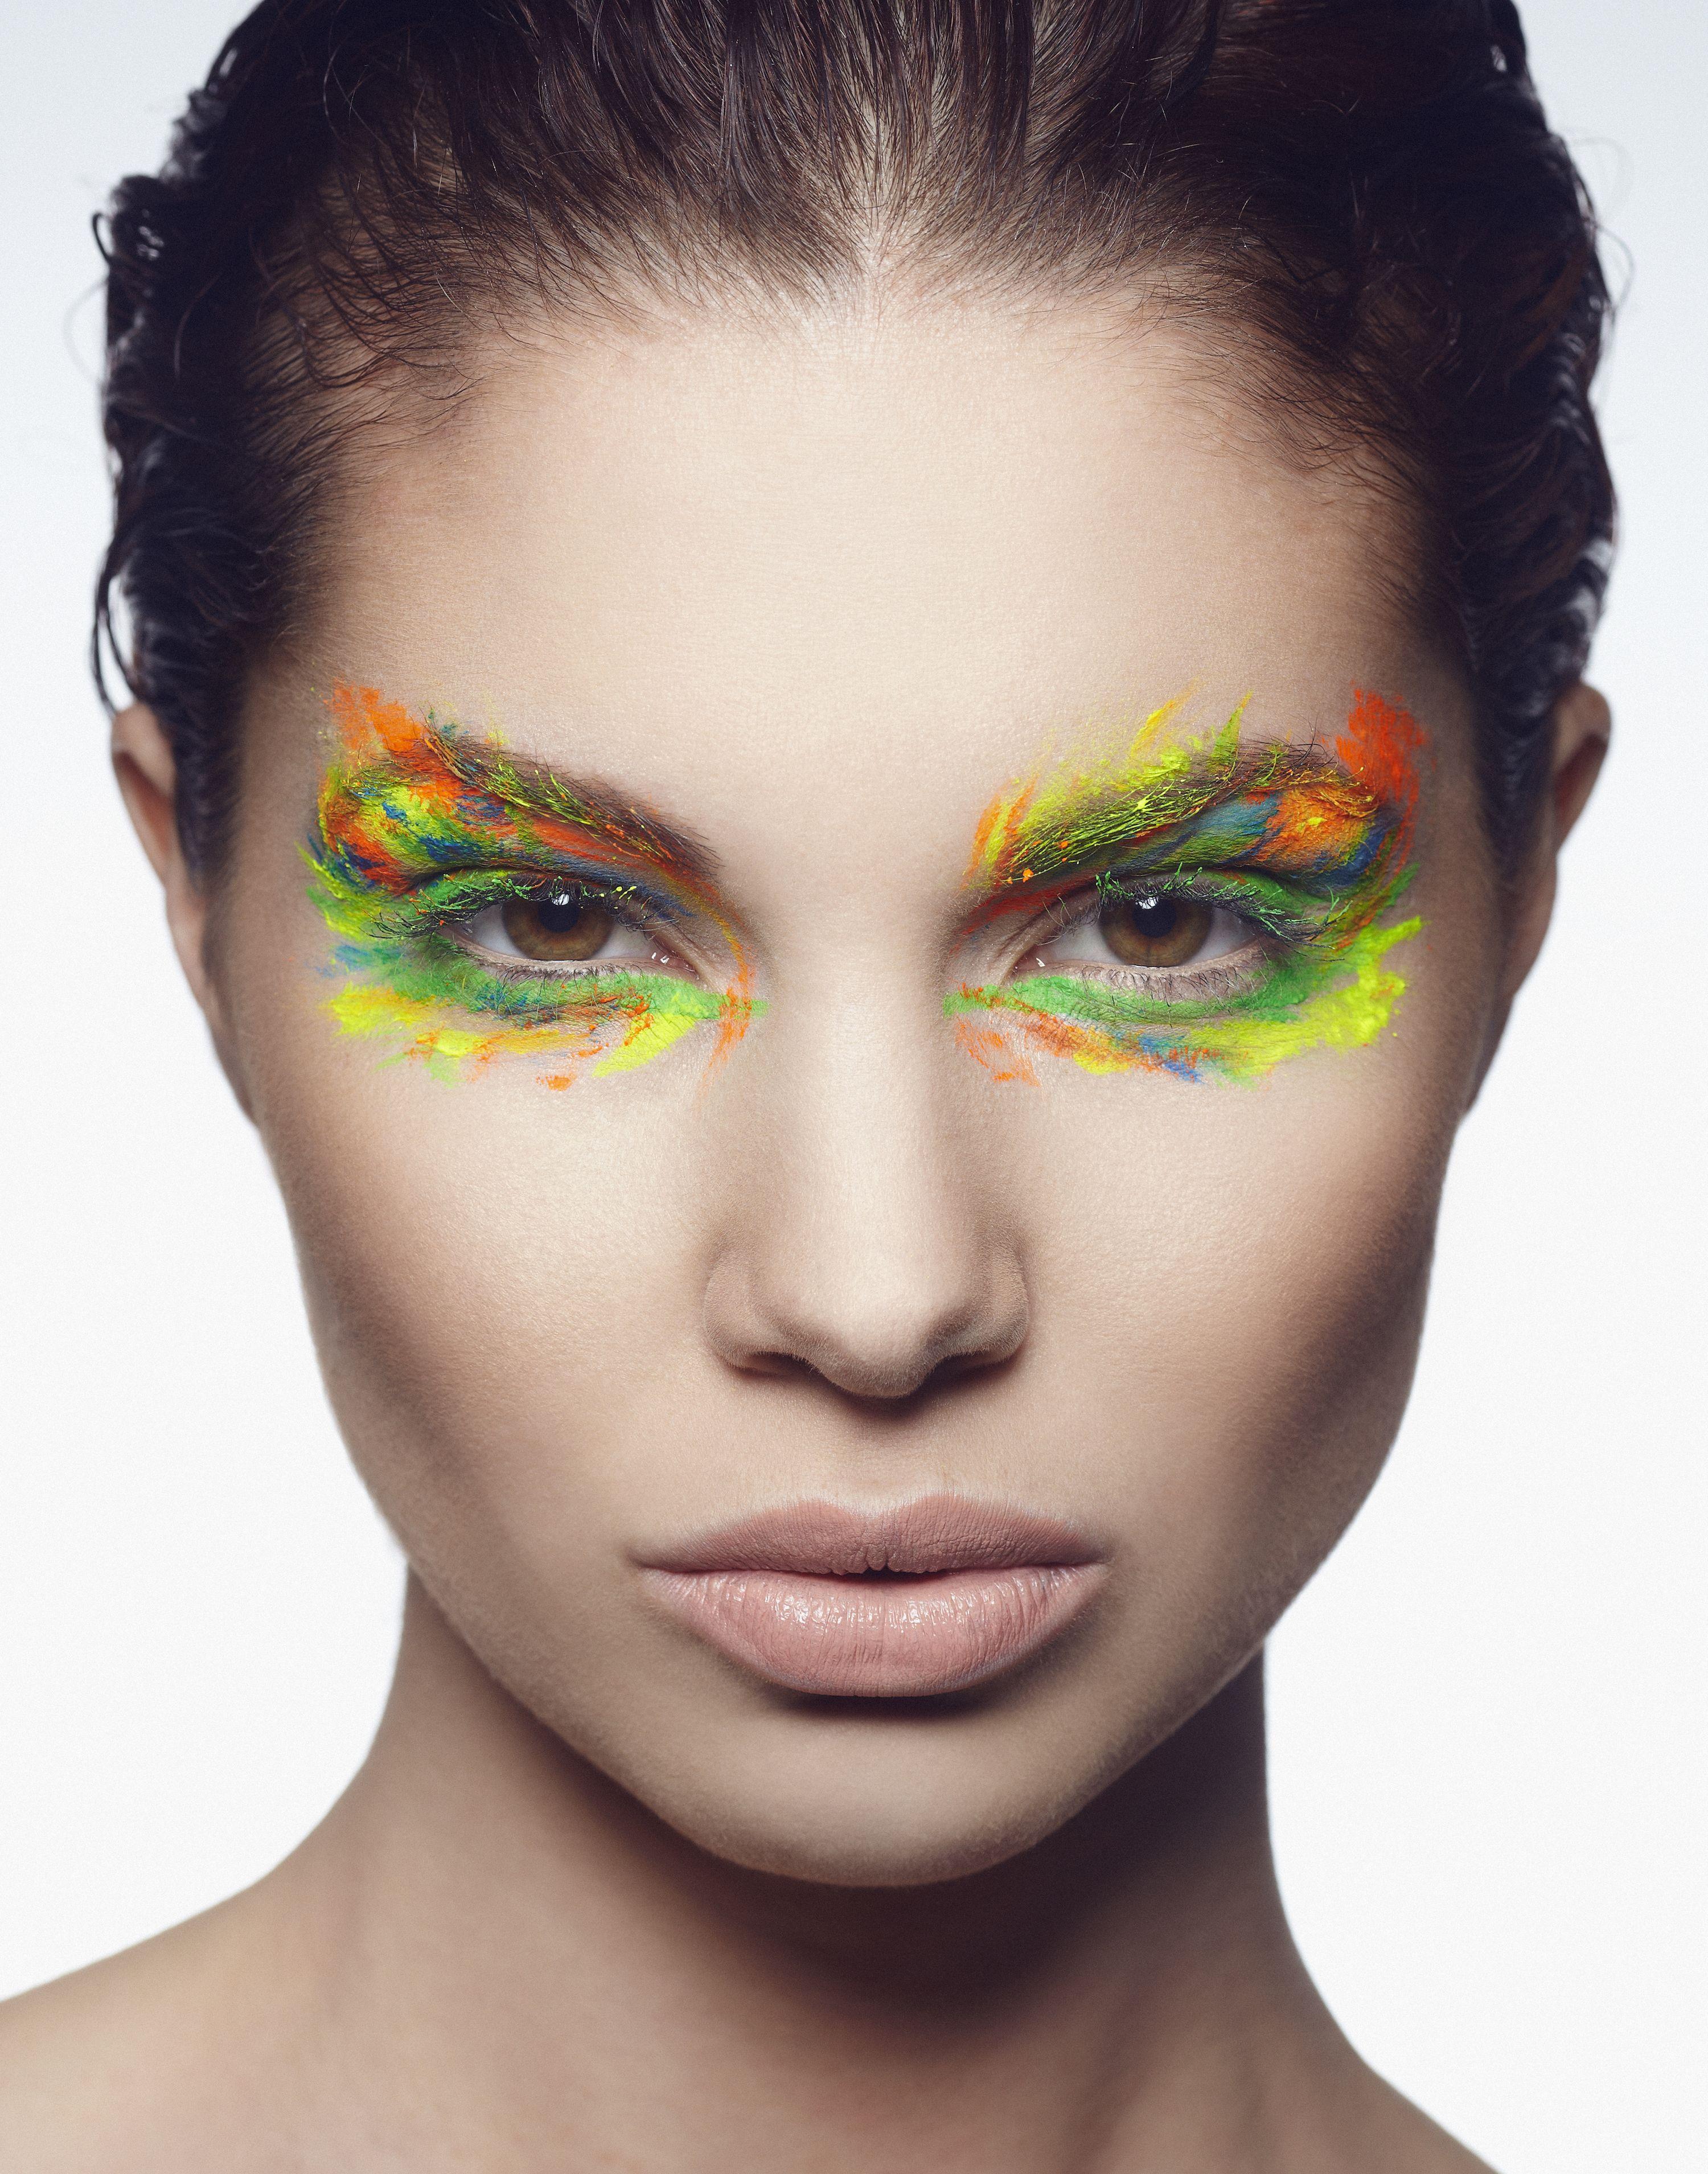 Makeup By Alexa Rae Www Artistrybyalexa Com Hair Styling By